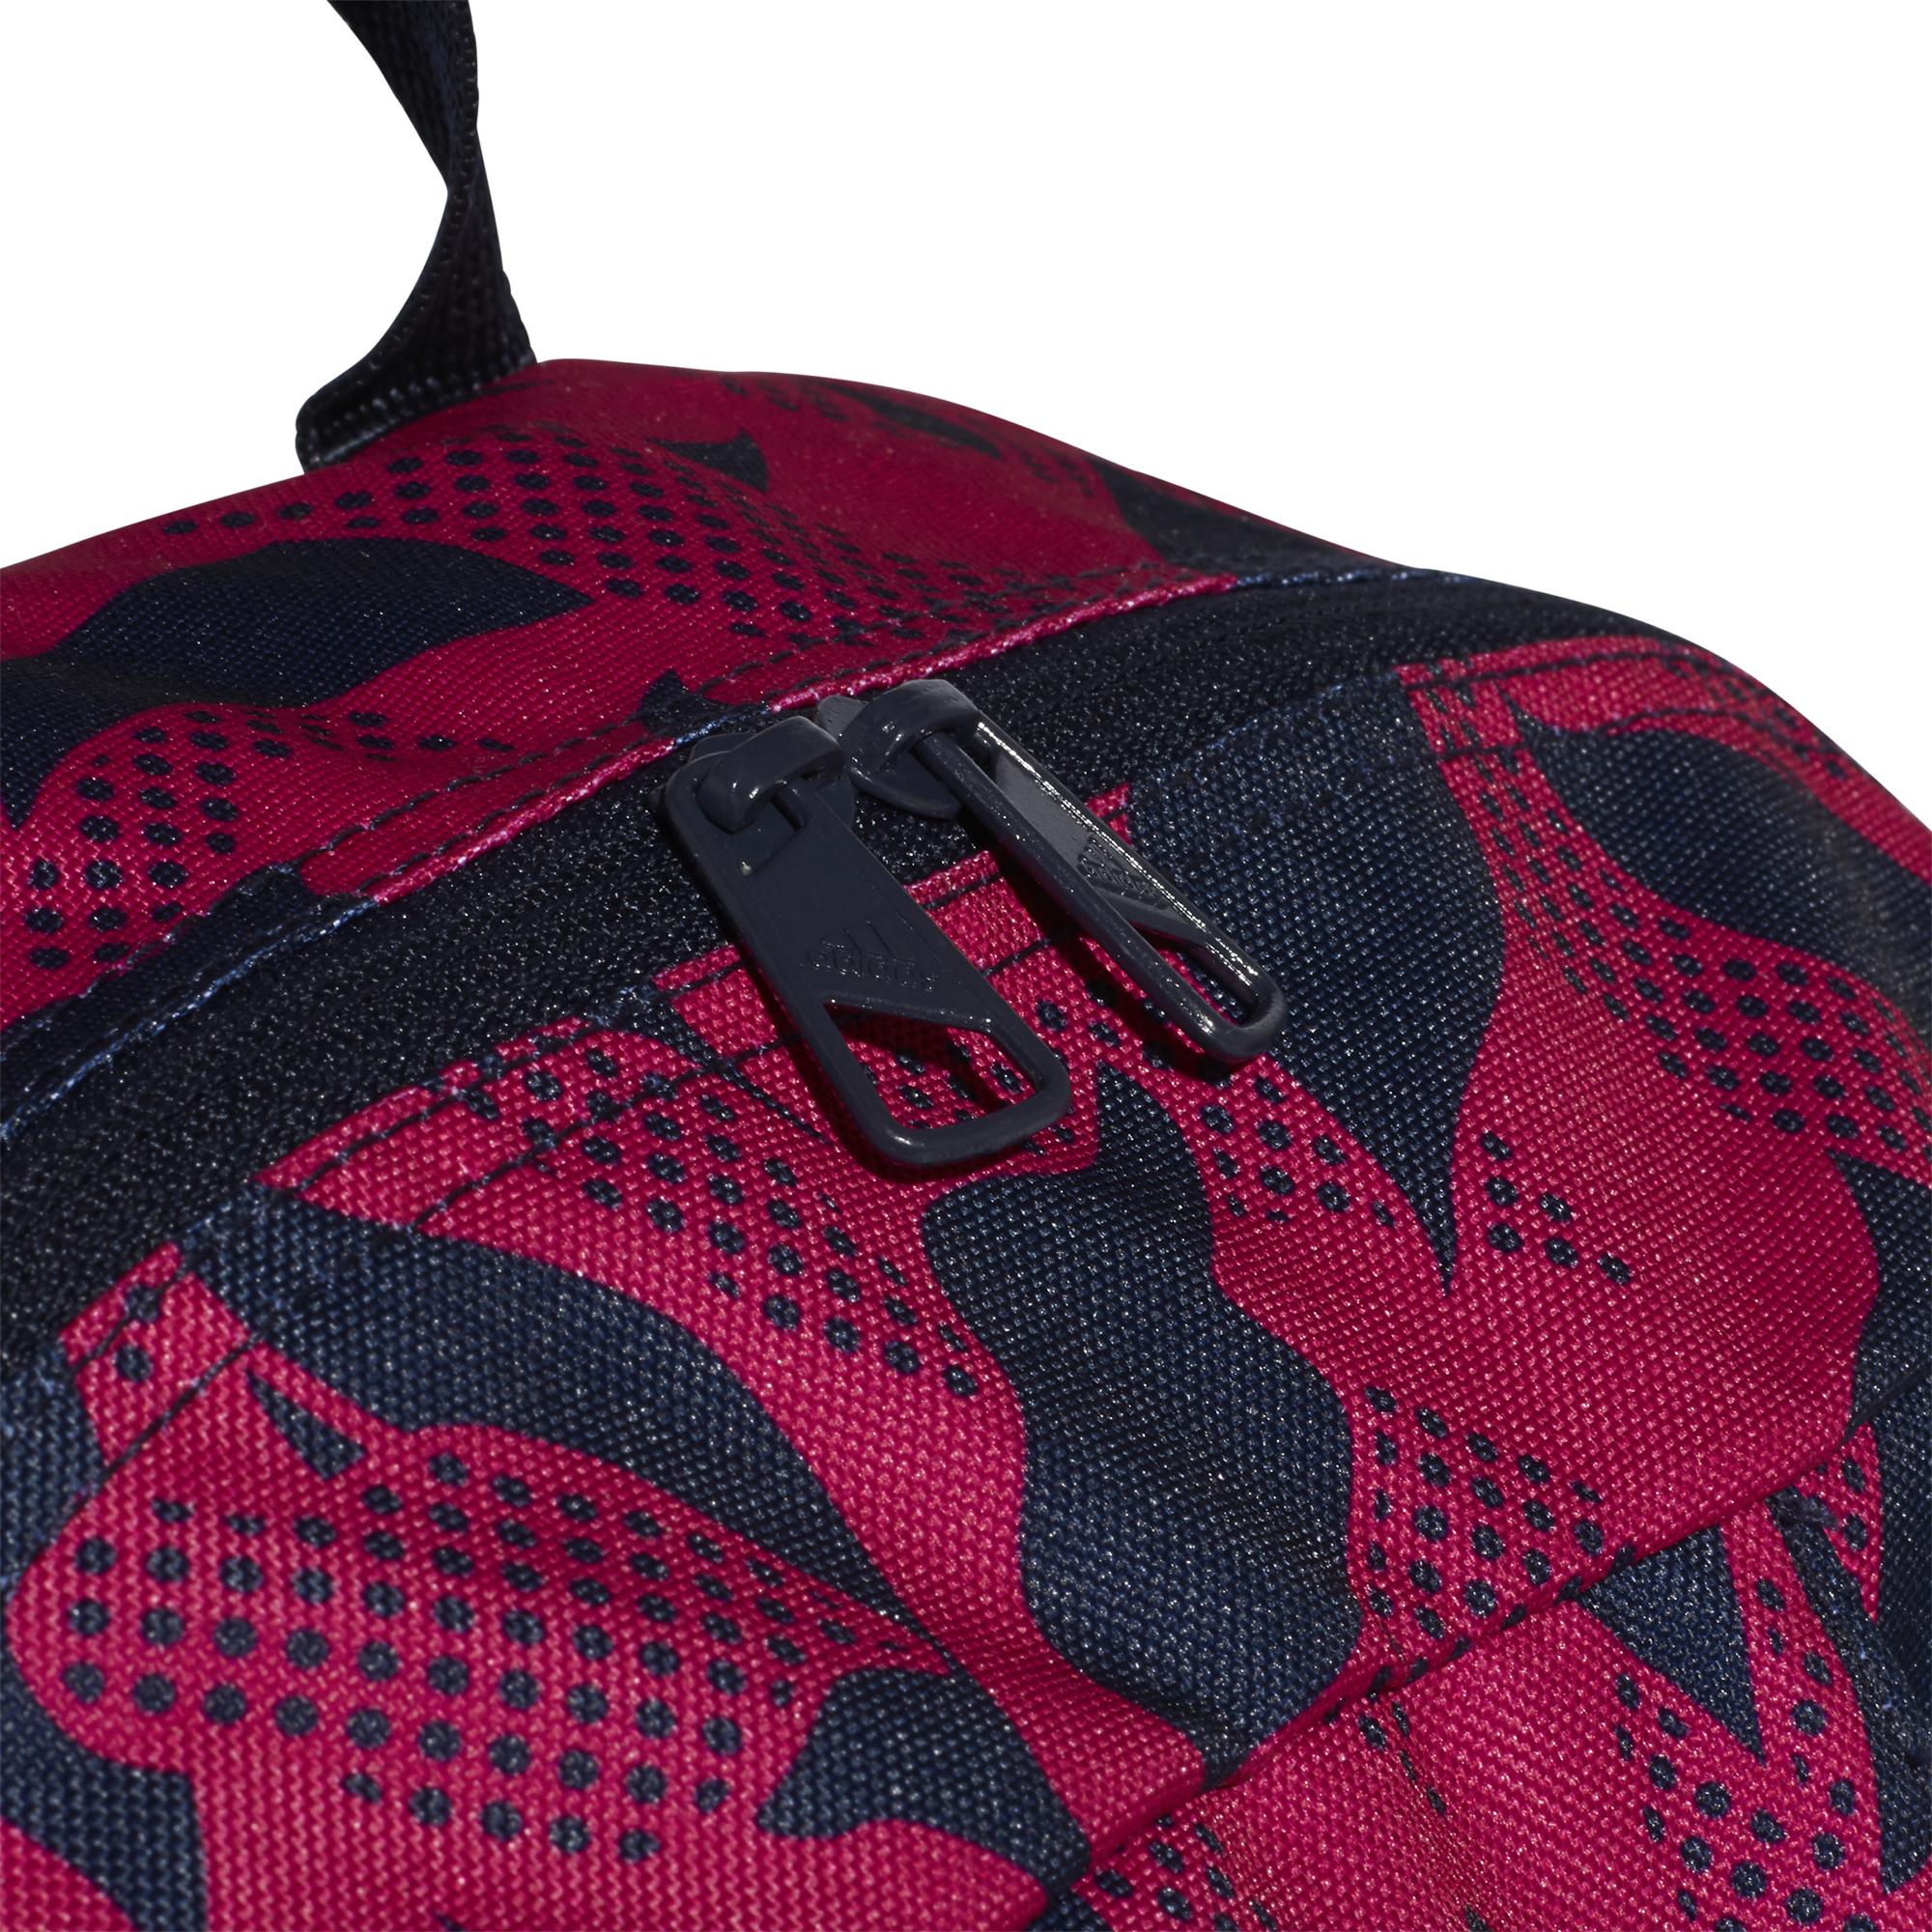 feb30a43ef88c plecak adidas Linear Graphic DJ2113    timsport.pl - dodatkowe ...